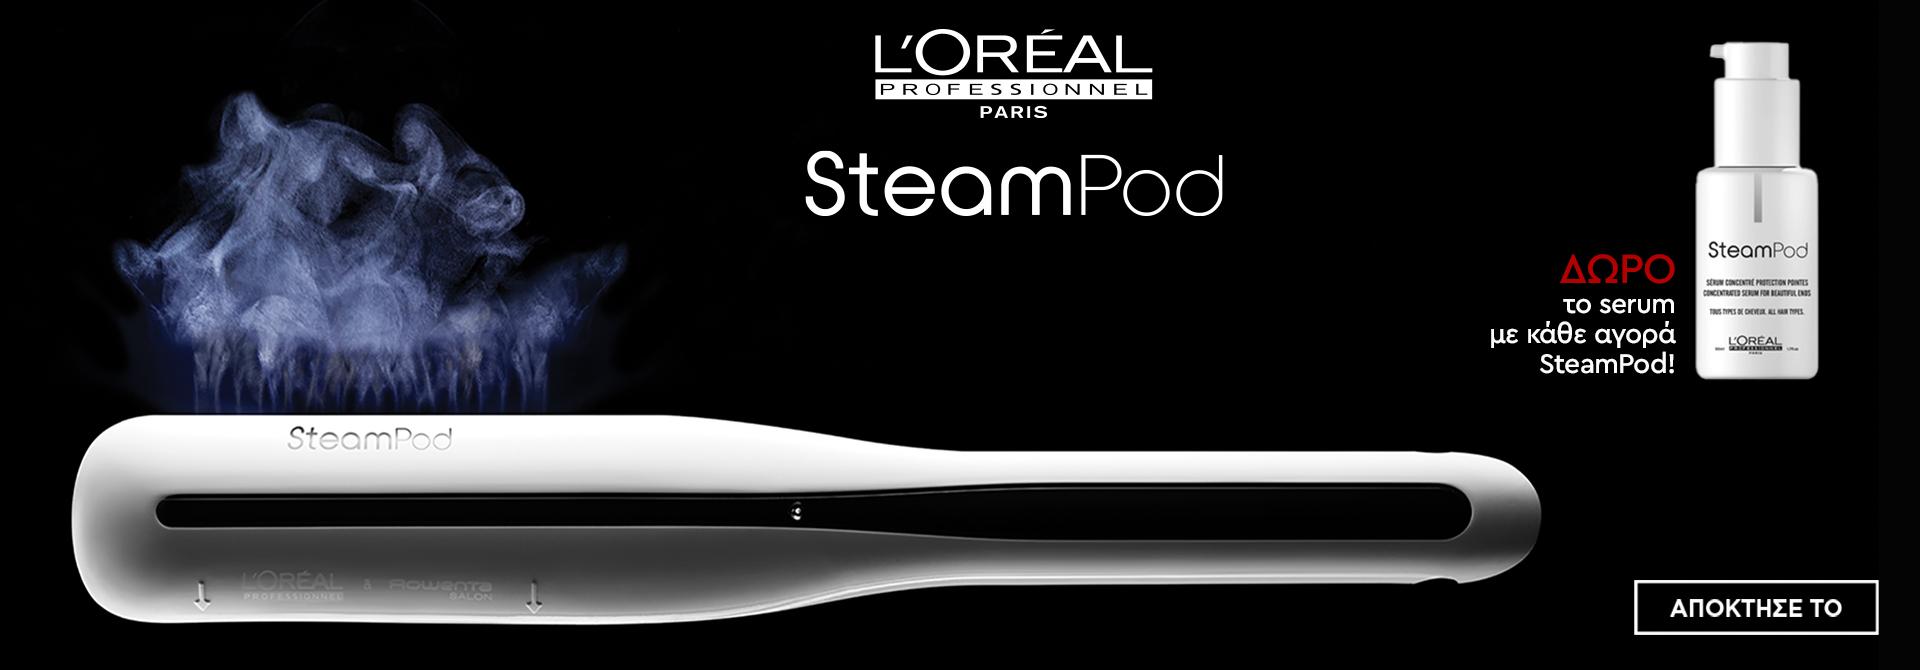 Steampod L'Oreal professionnel Letif.gr